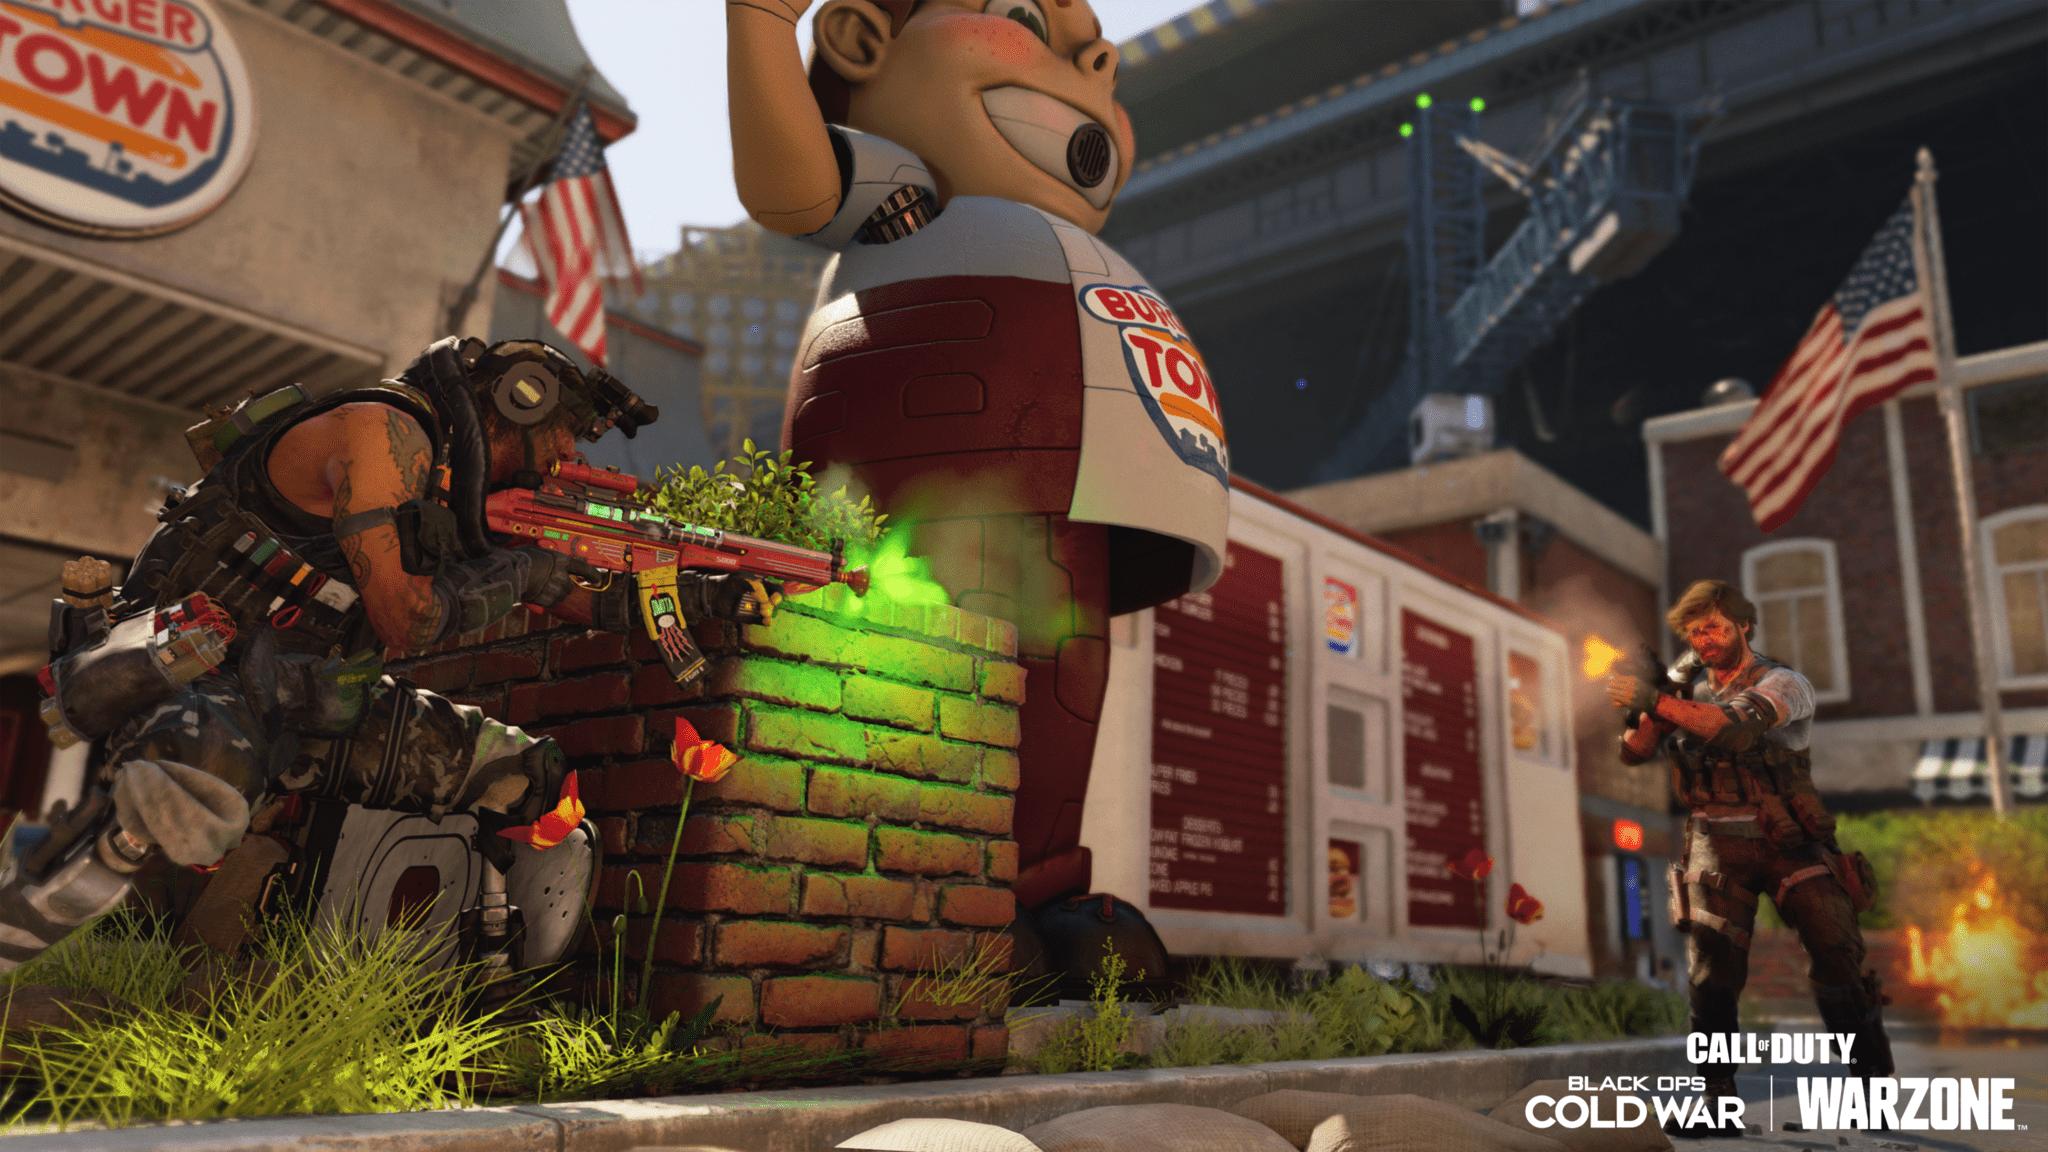 Black Ops Cold War Update 1.24